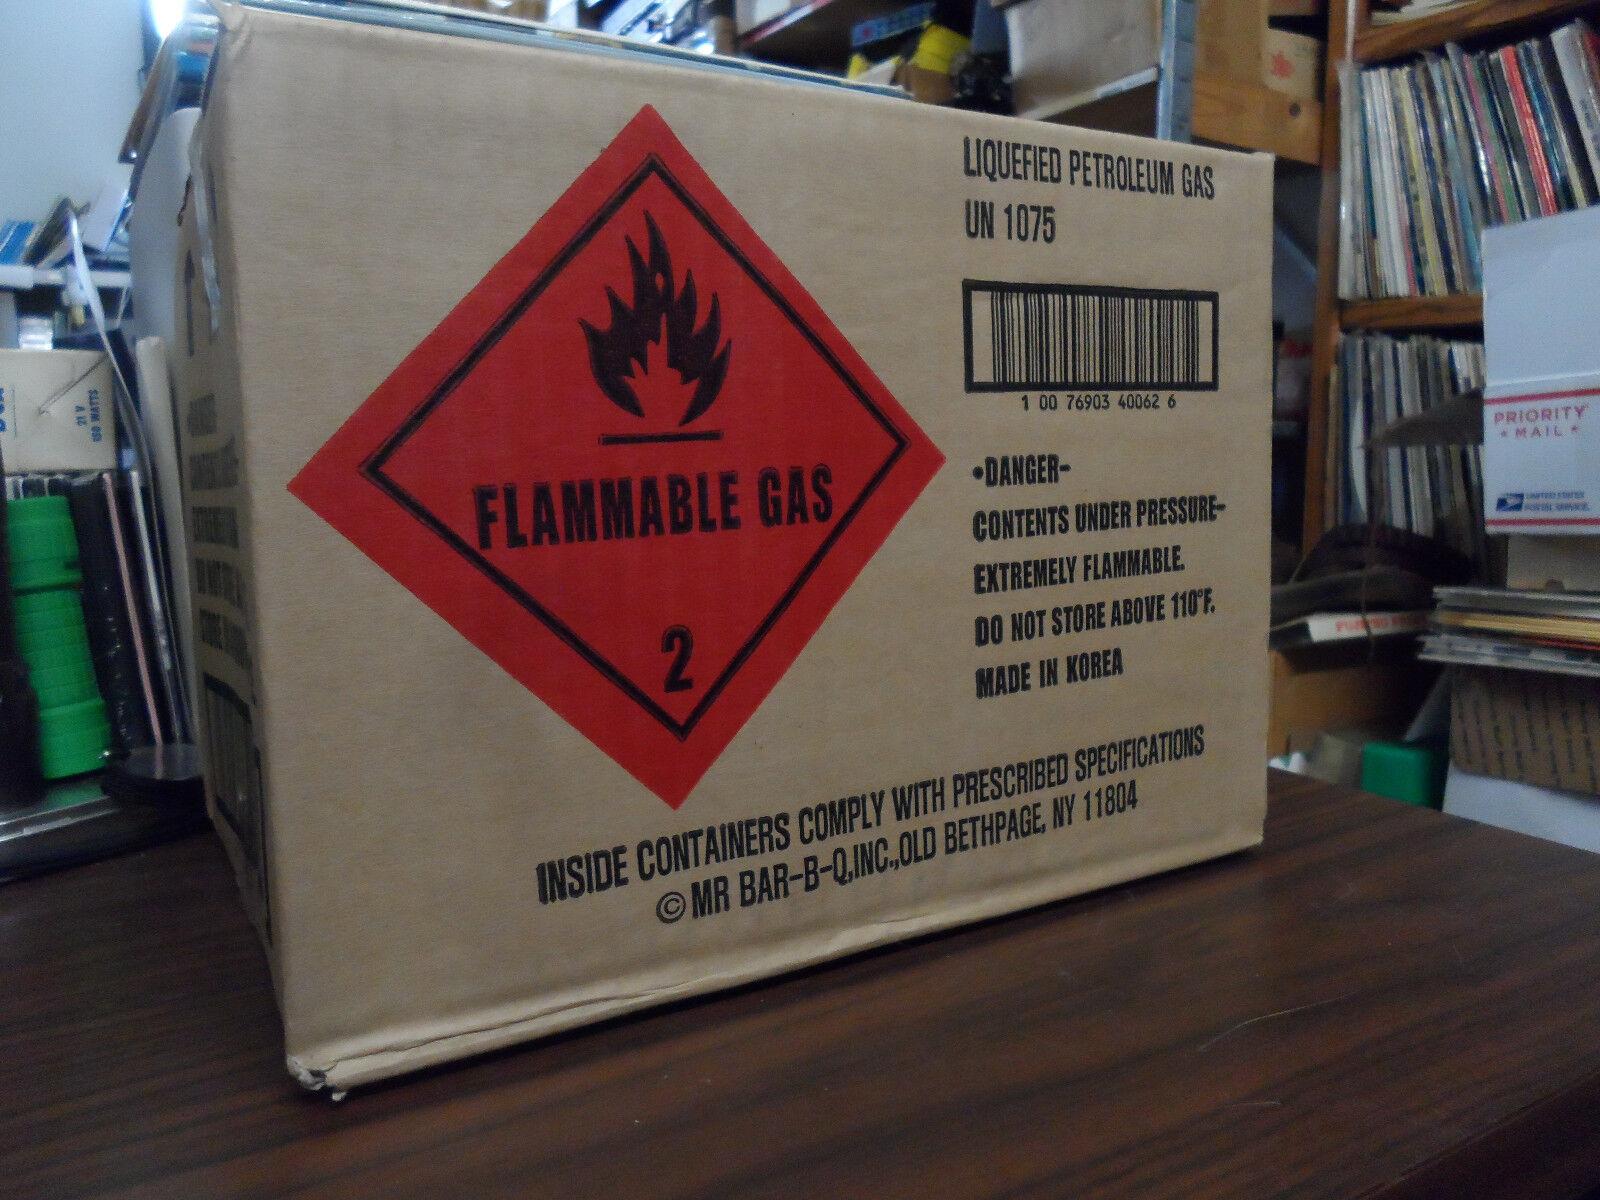 NIB Mr. Bar-B-Q (8 oz.) Butane Fuel  For Portable Gas Stove Cans  customers first